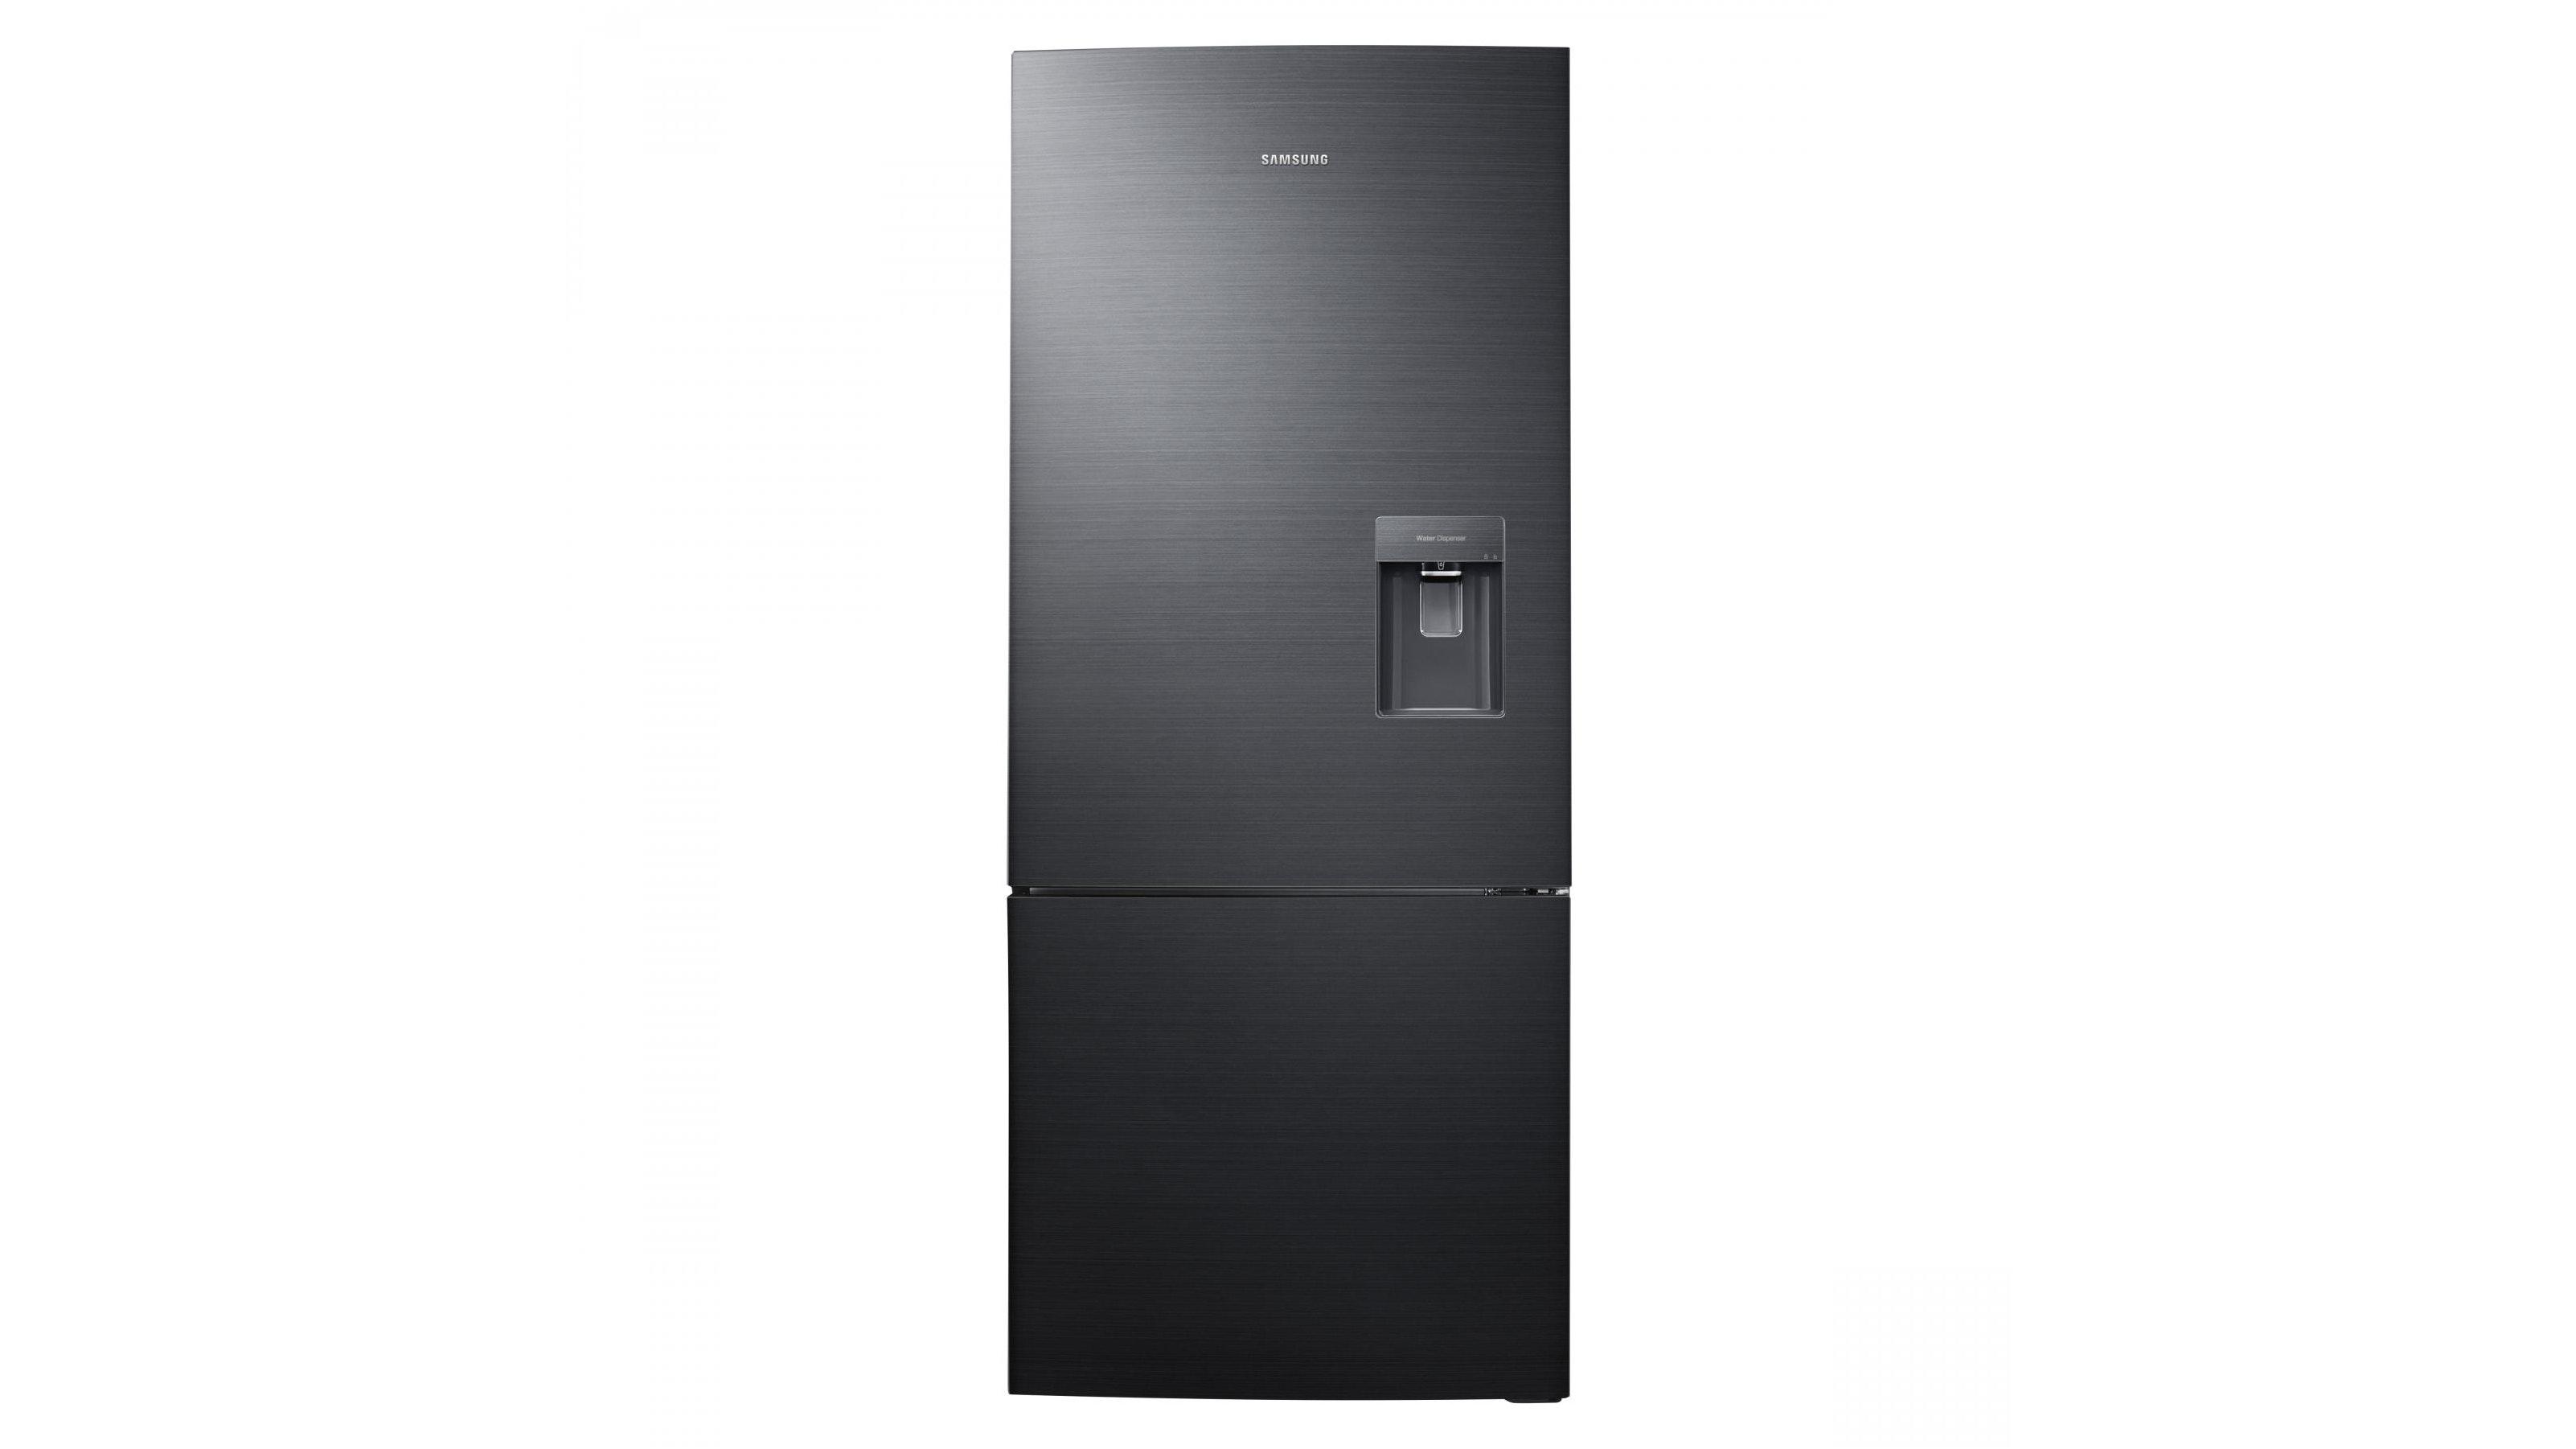 Samsung 455l Bottom Mount Fridge Metallic Black Domayne